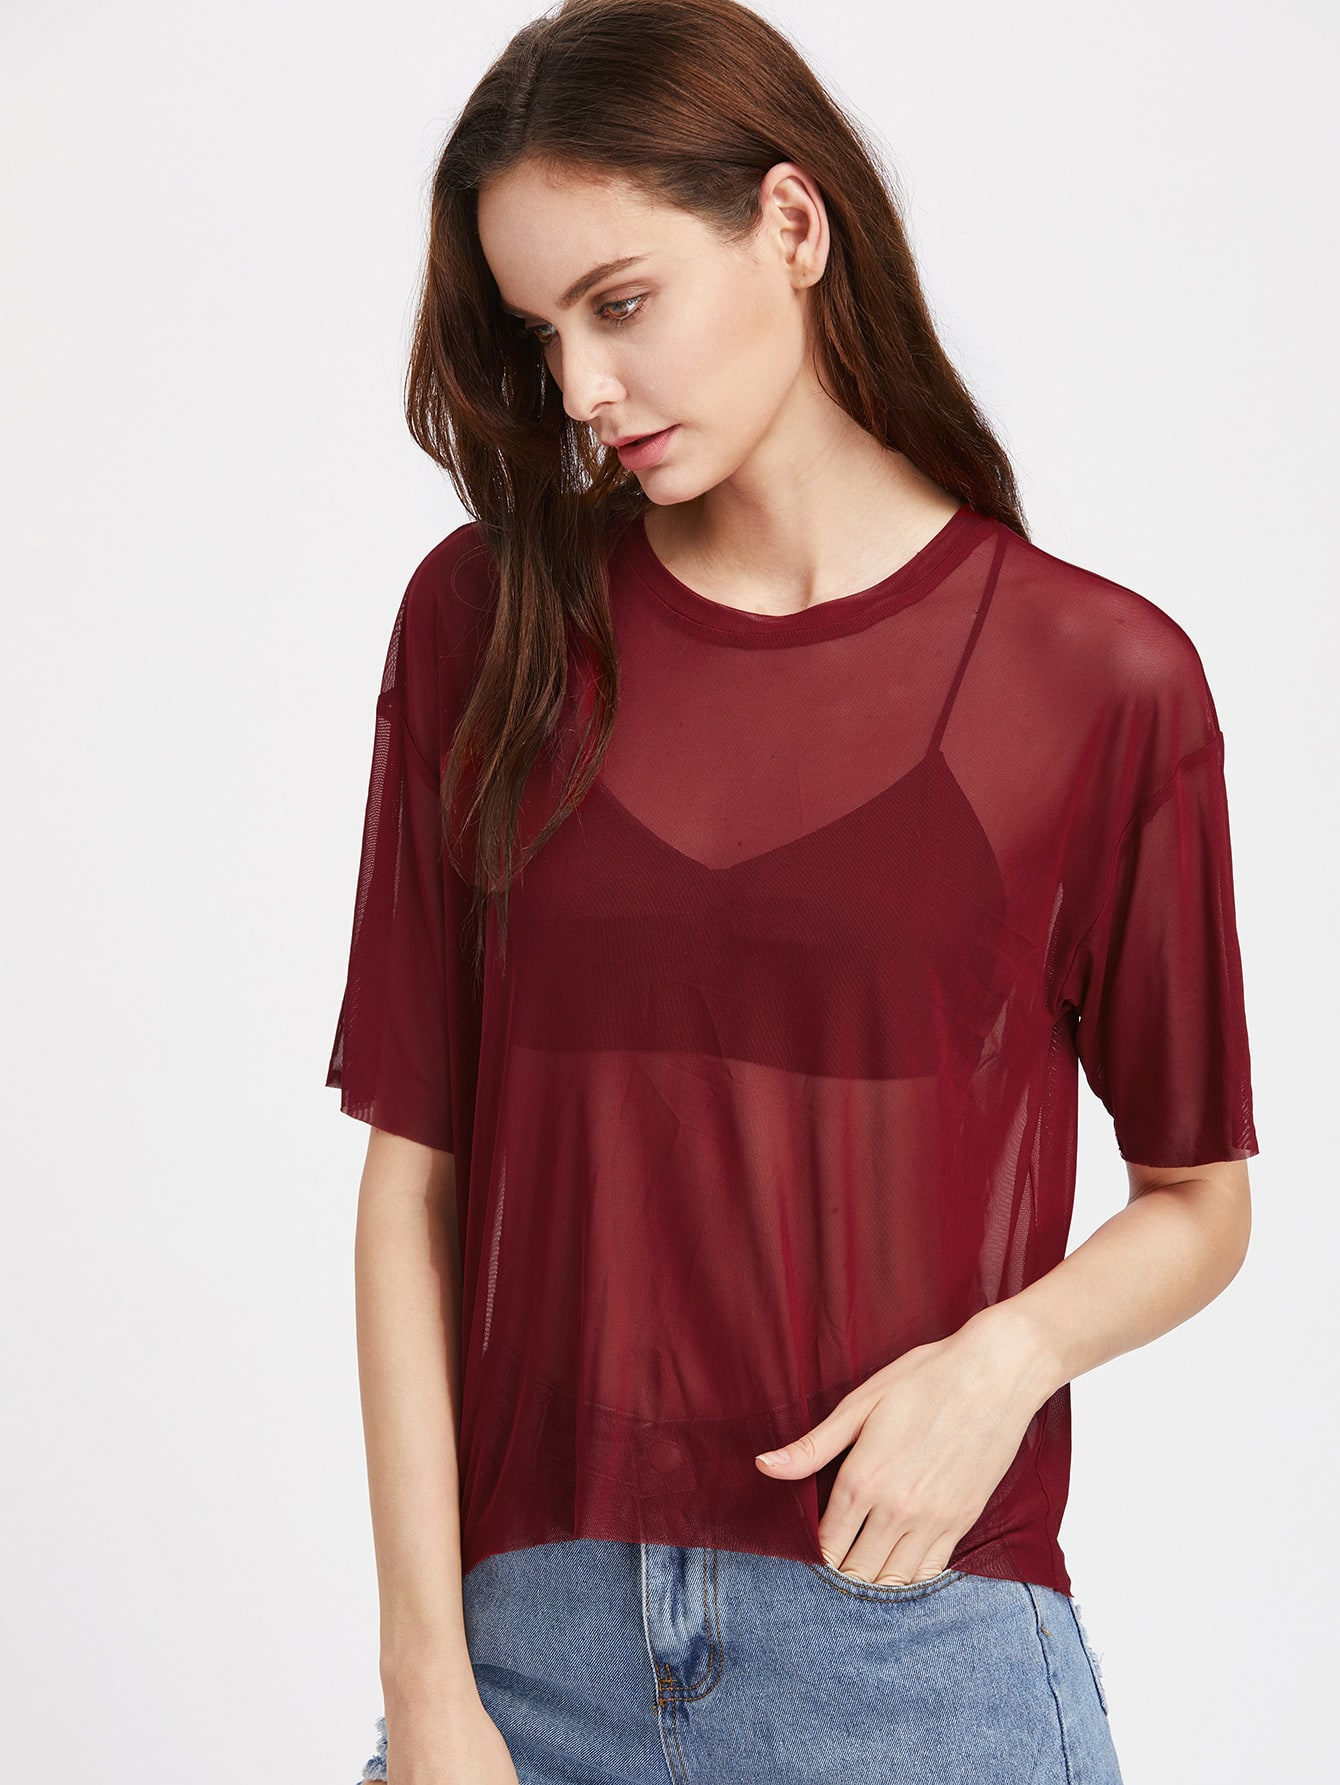 blouse170424704_2